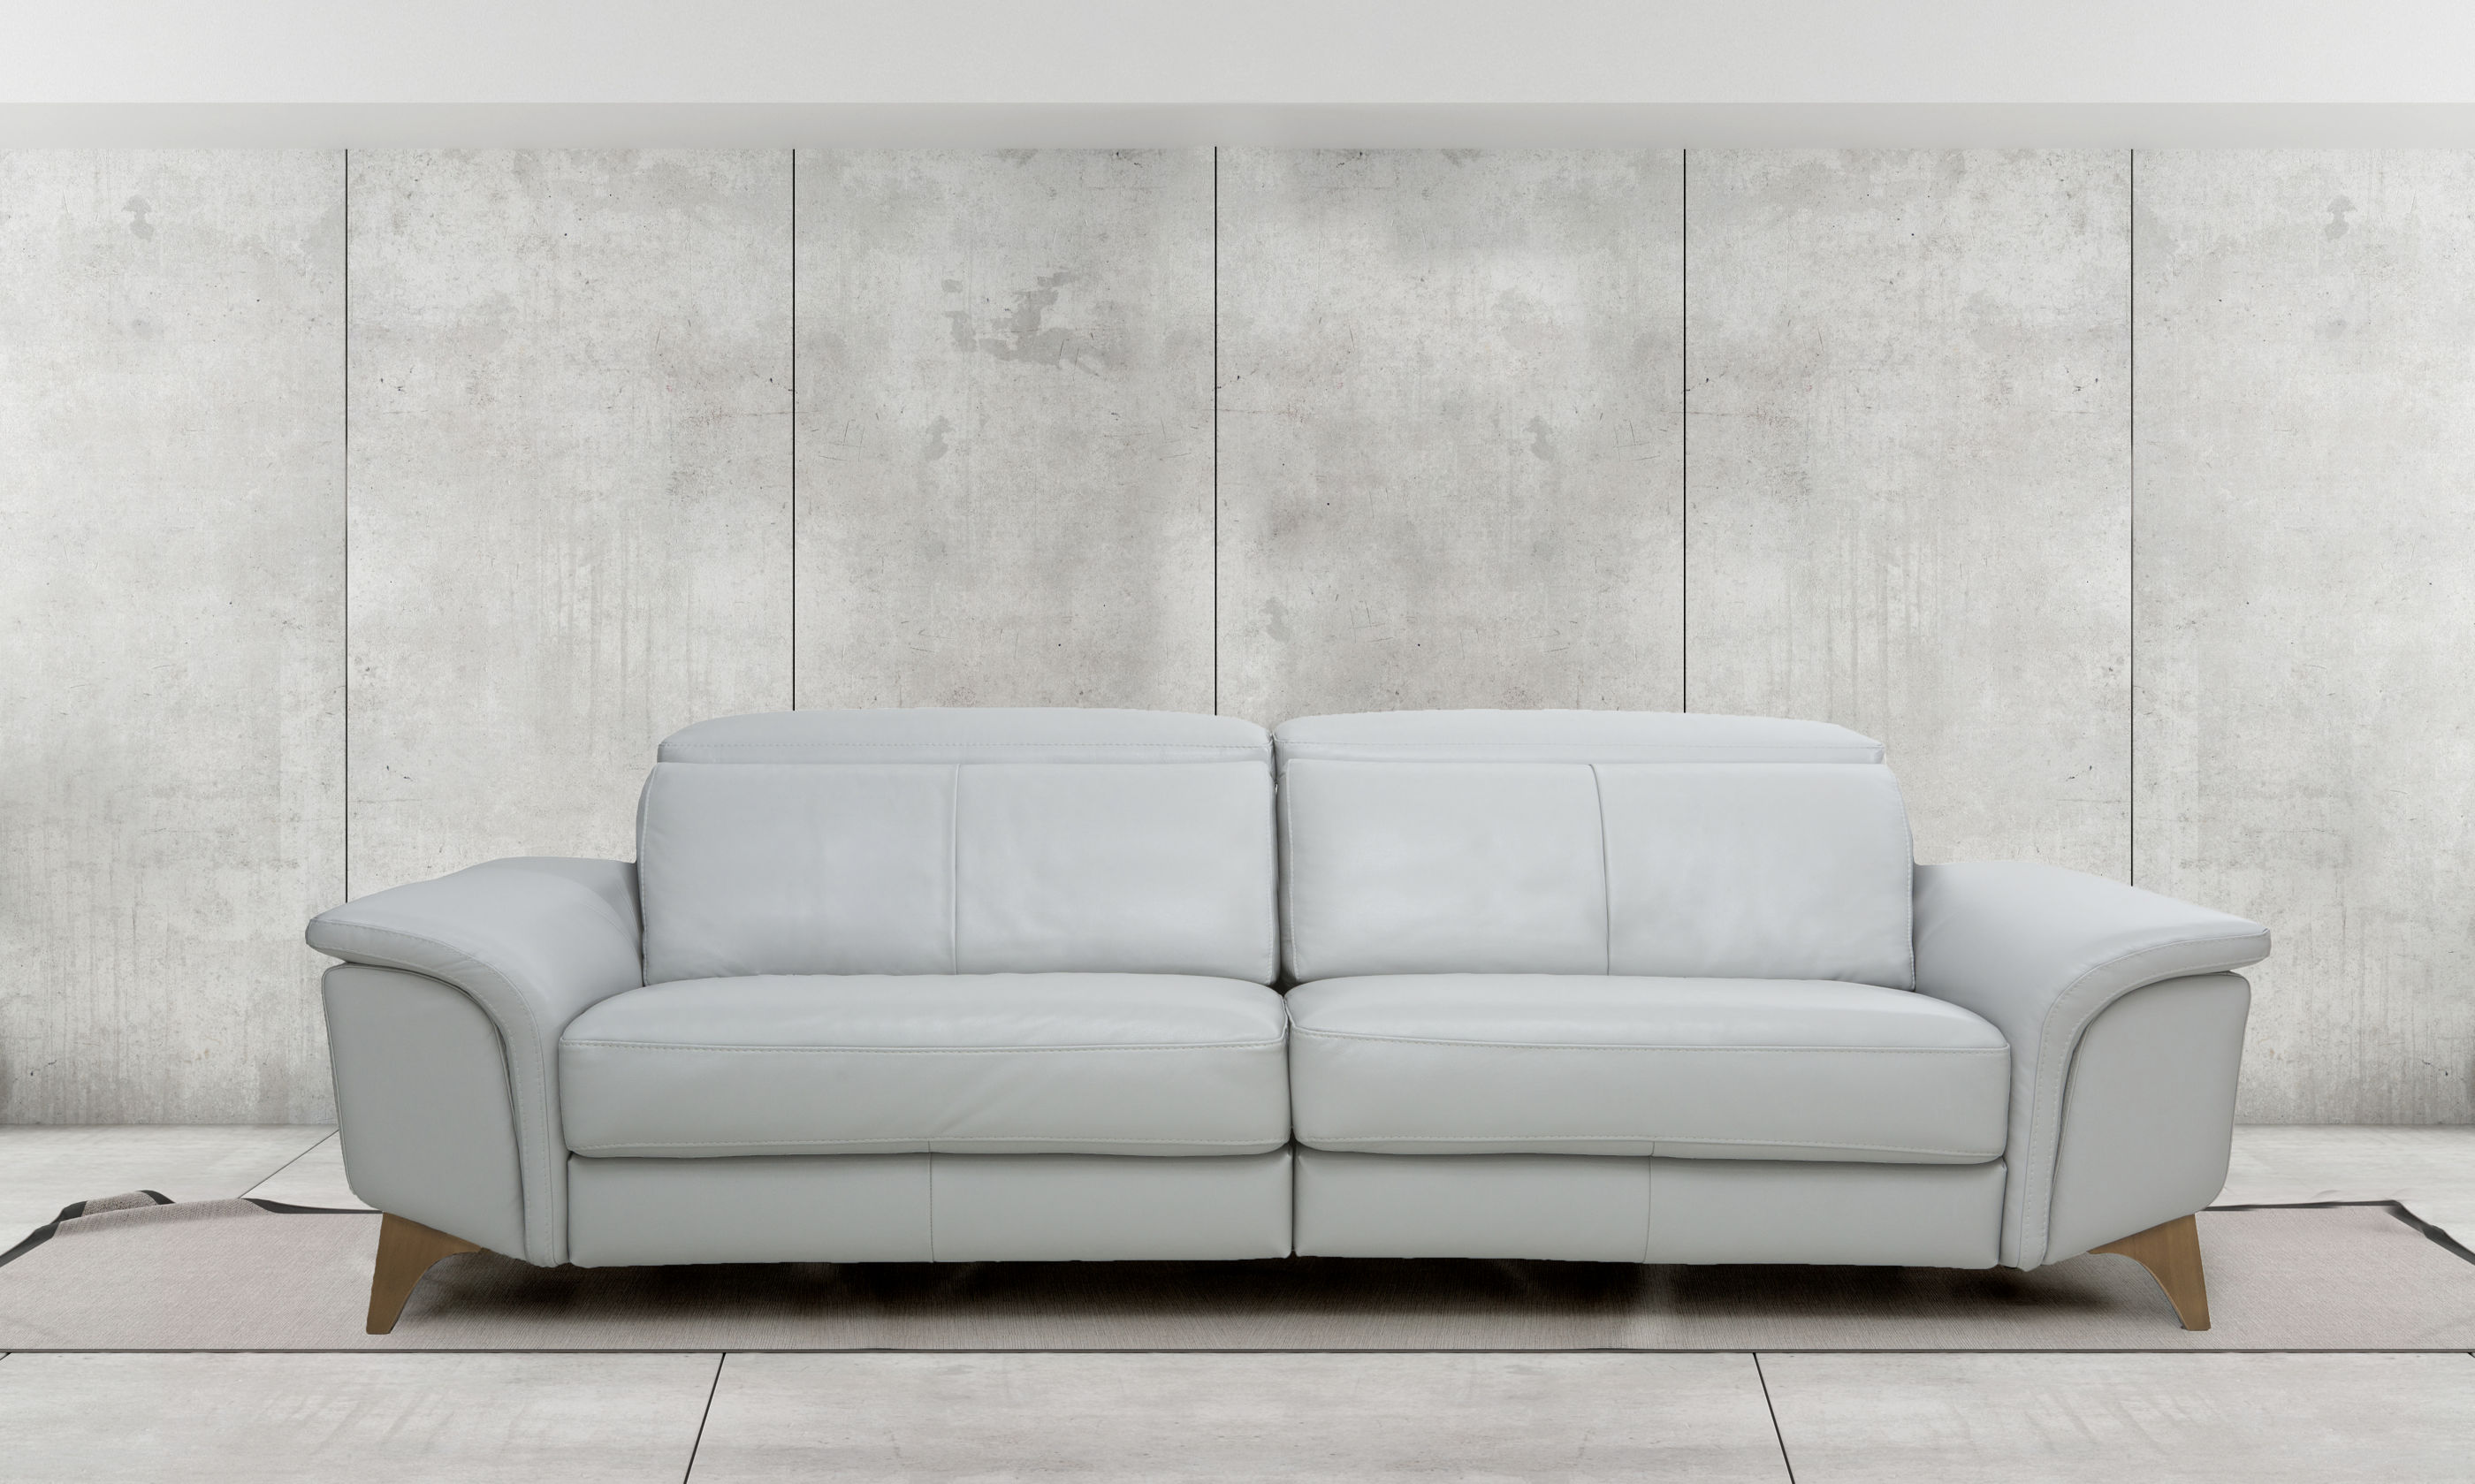 Muebles lozano sofas obtenga ideas dise o de muebles for Muebles lucena liquidacion